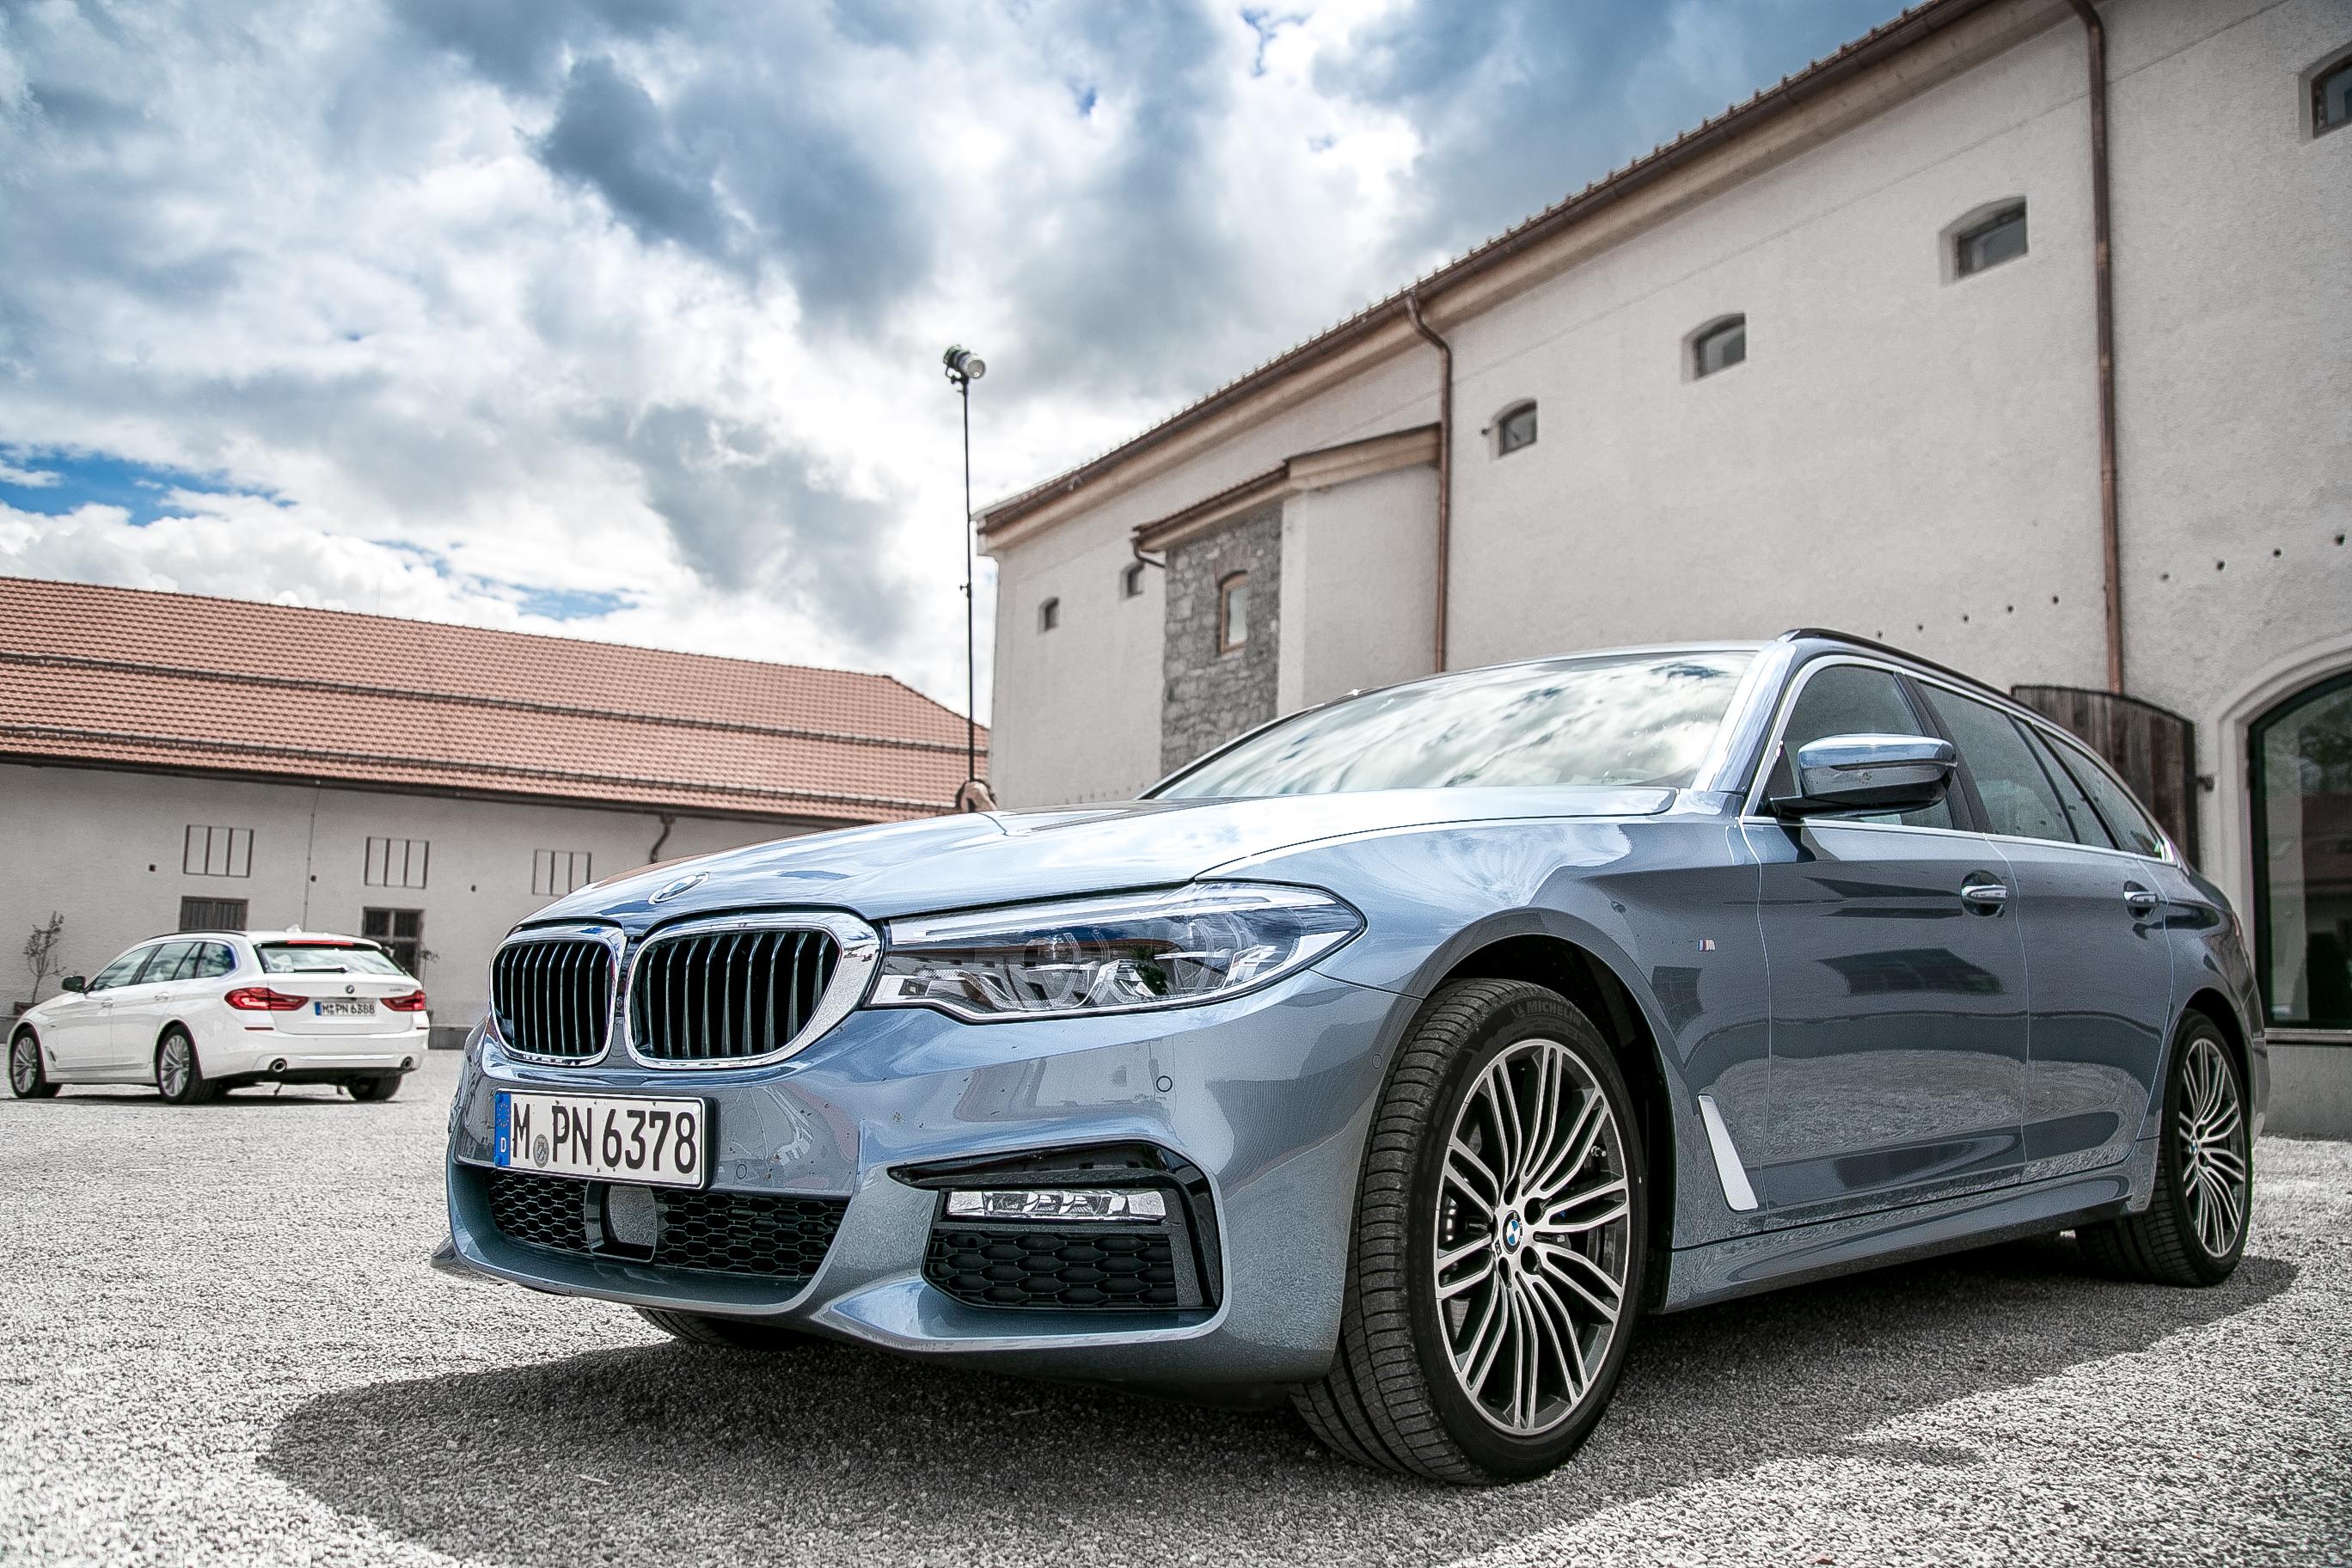 Ein Freitag am Tegernsee mit dem neuen BMW 5er Touring Testbericht Fahrbericht BMW BMW5er 5erTouring G31 2017 Testdrive pepperandgold 5Series FreudeAmFahren PepperAndGold SheerDrivingPleasure